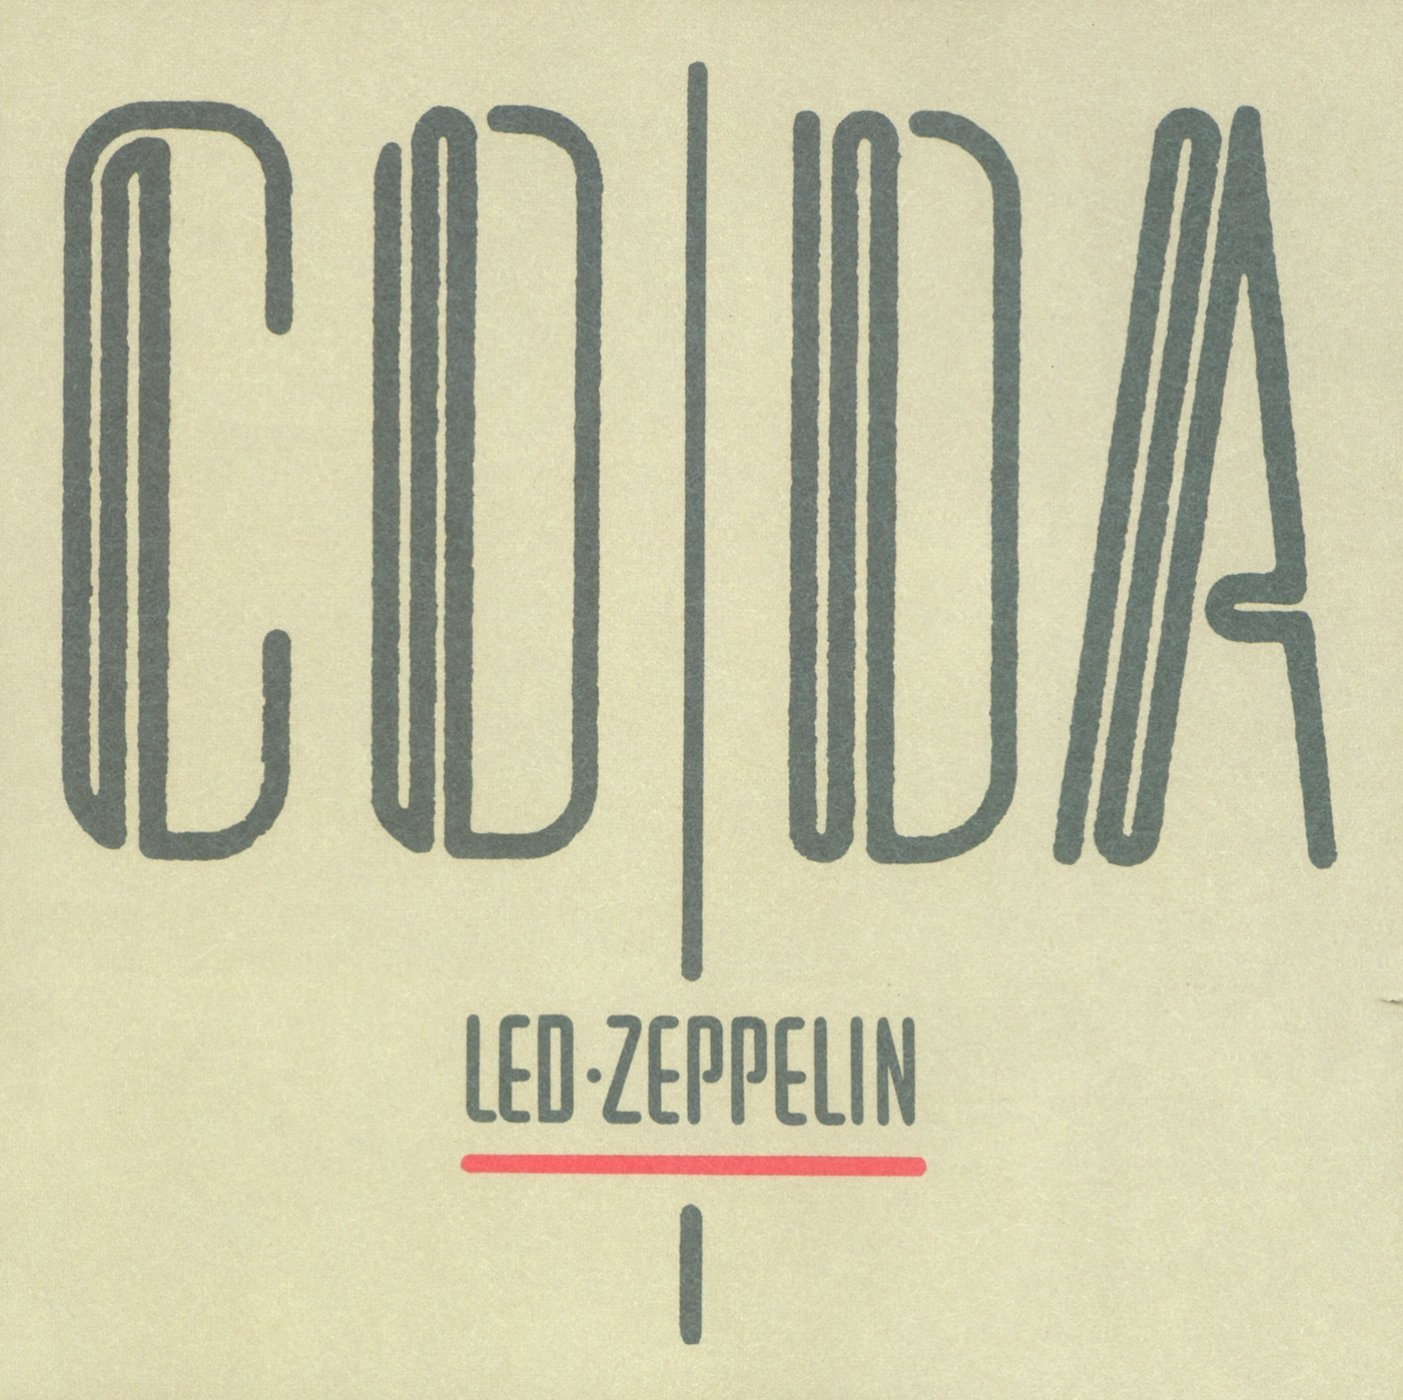 LED ZEPPELIN - CODA -RMX (CD)